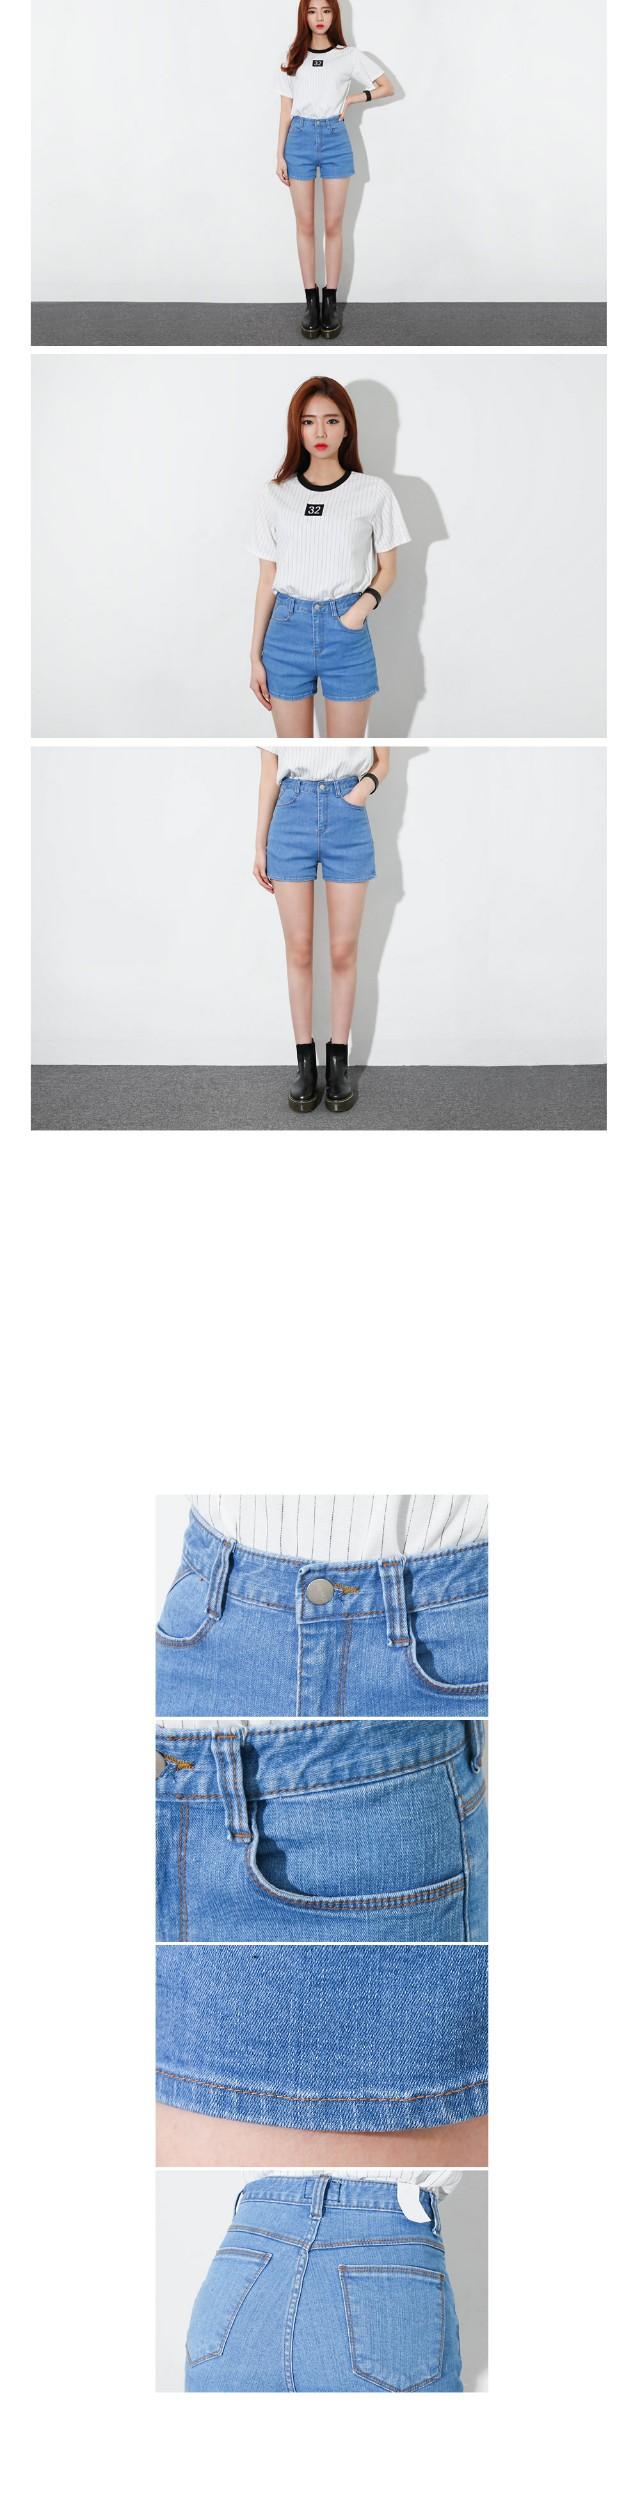 Nomome Core High 3 Pants